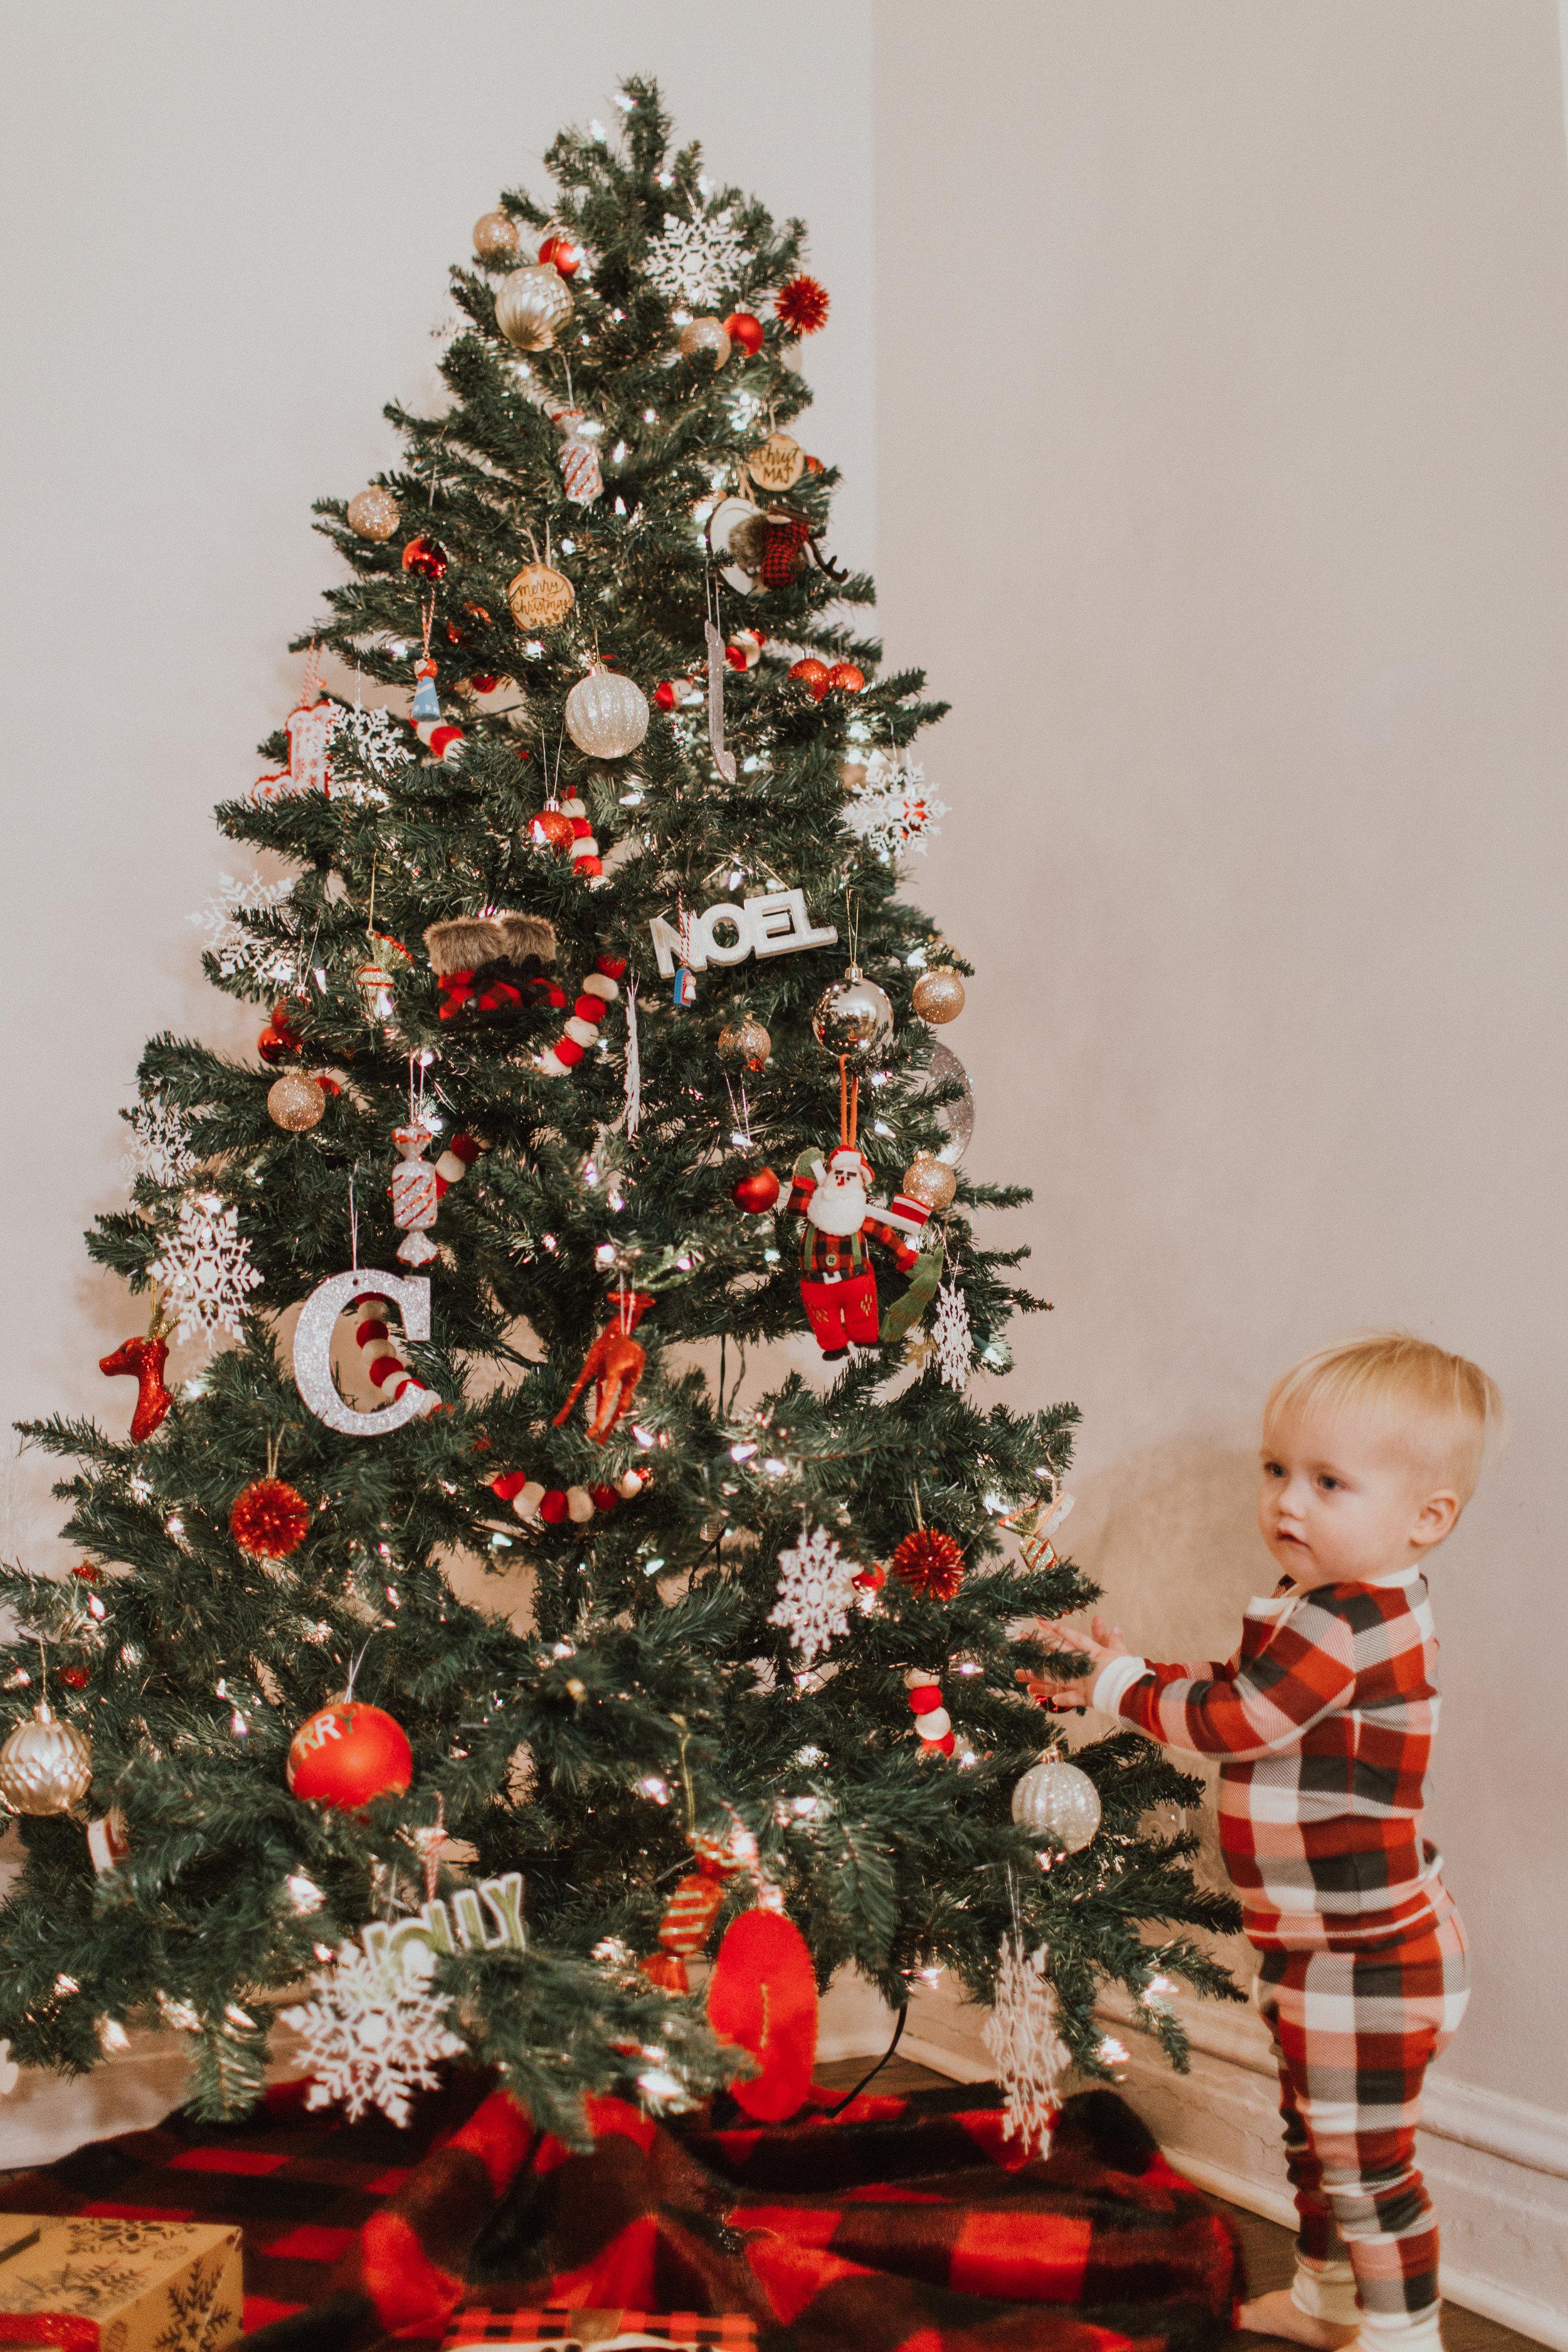 Christmas2017-5.jpg